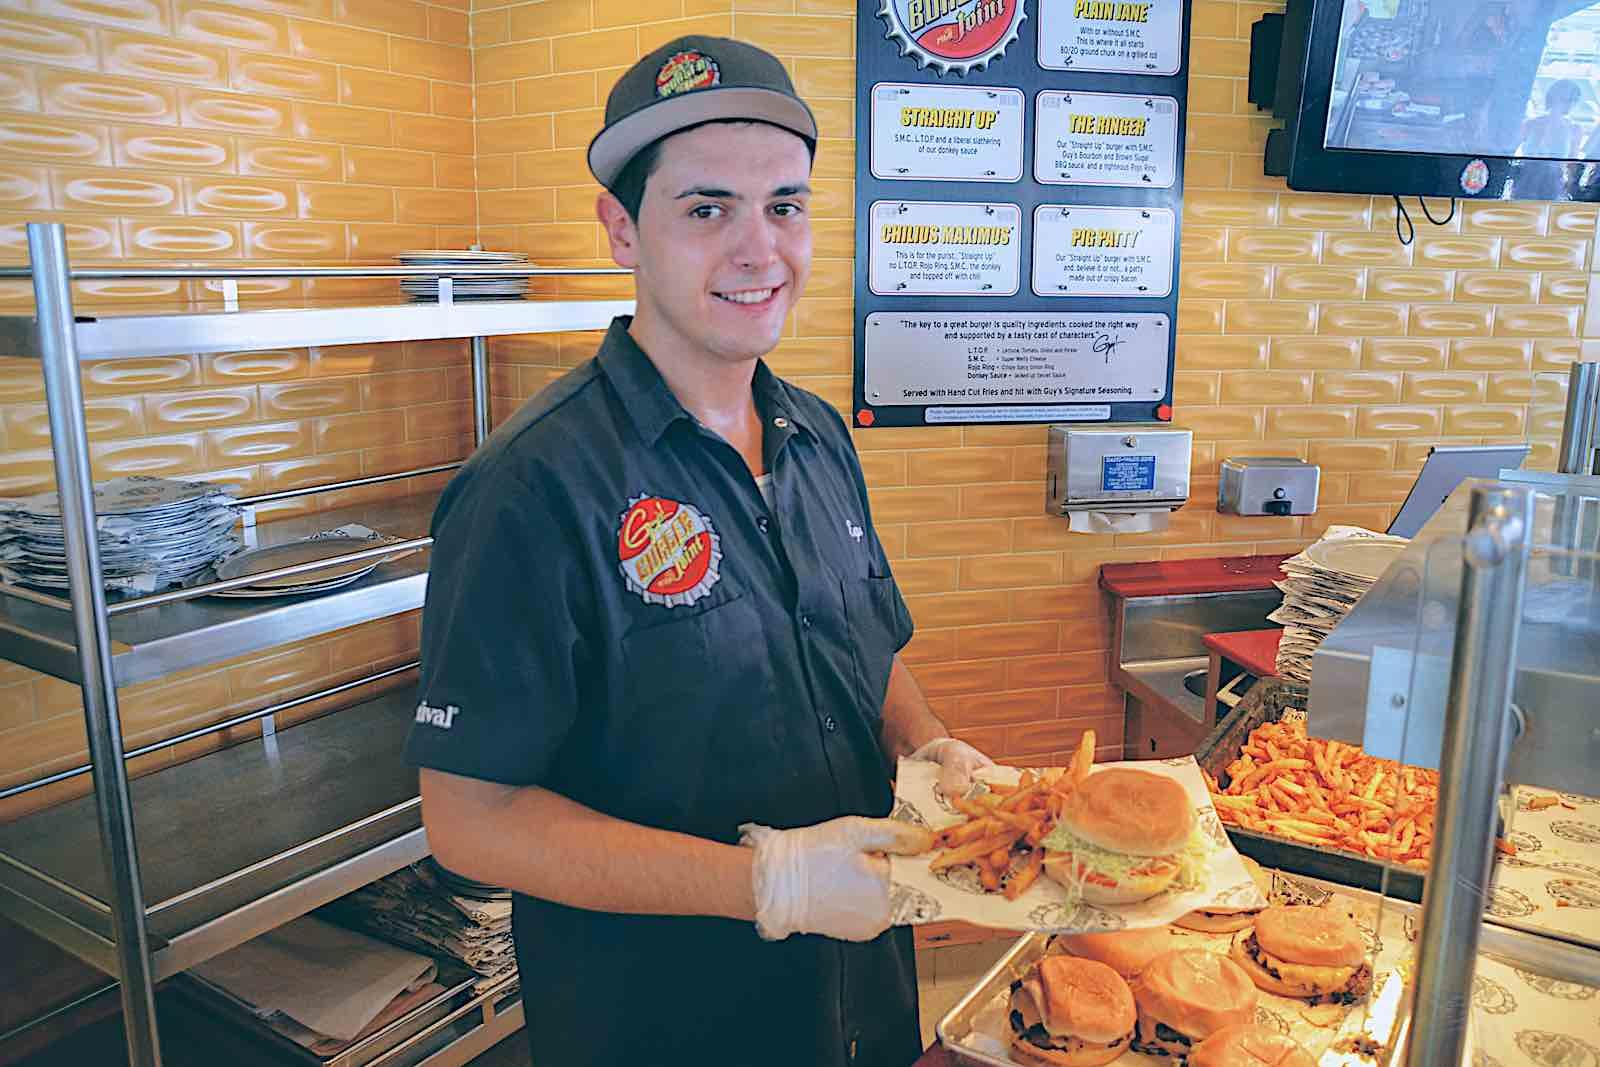 Guy's Burger Joint Line Cook in Uniform serves a Guy Fieri burger.